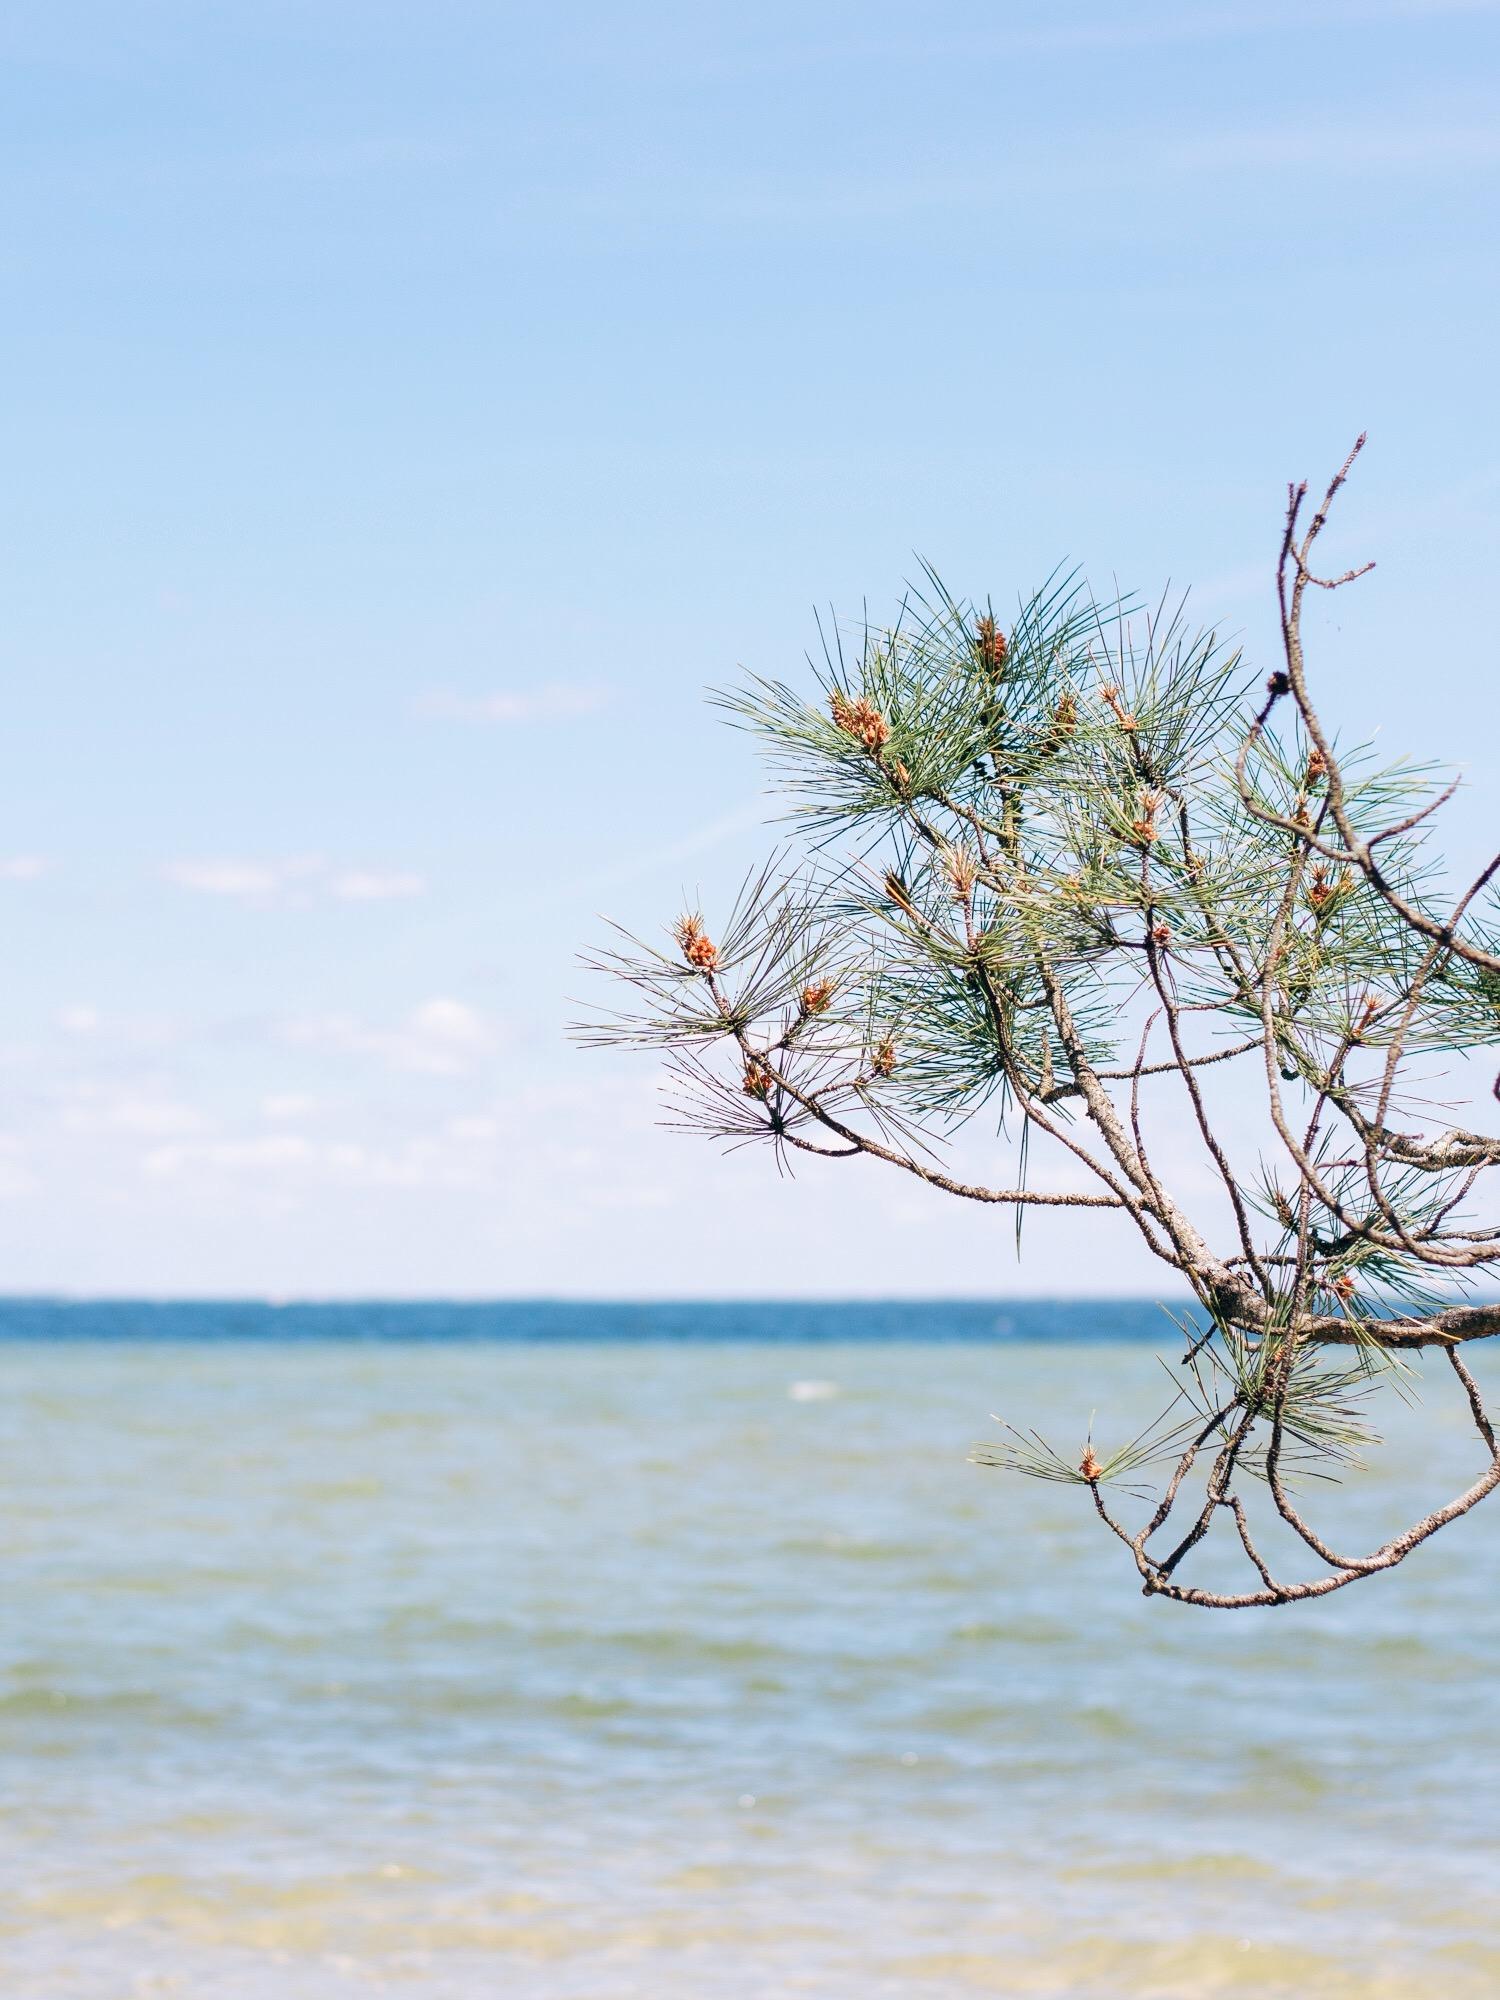 Leaf - Biscarrosse Grands Lacs - un week-end Slow